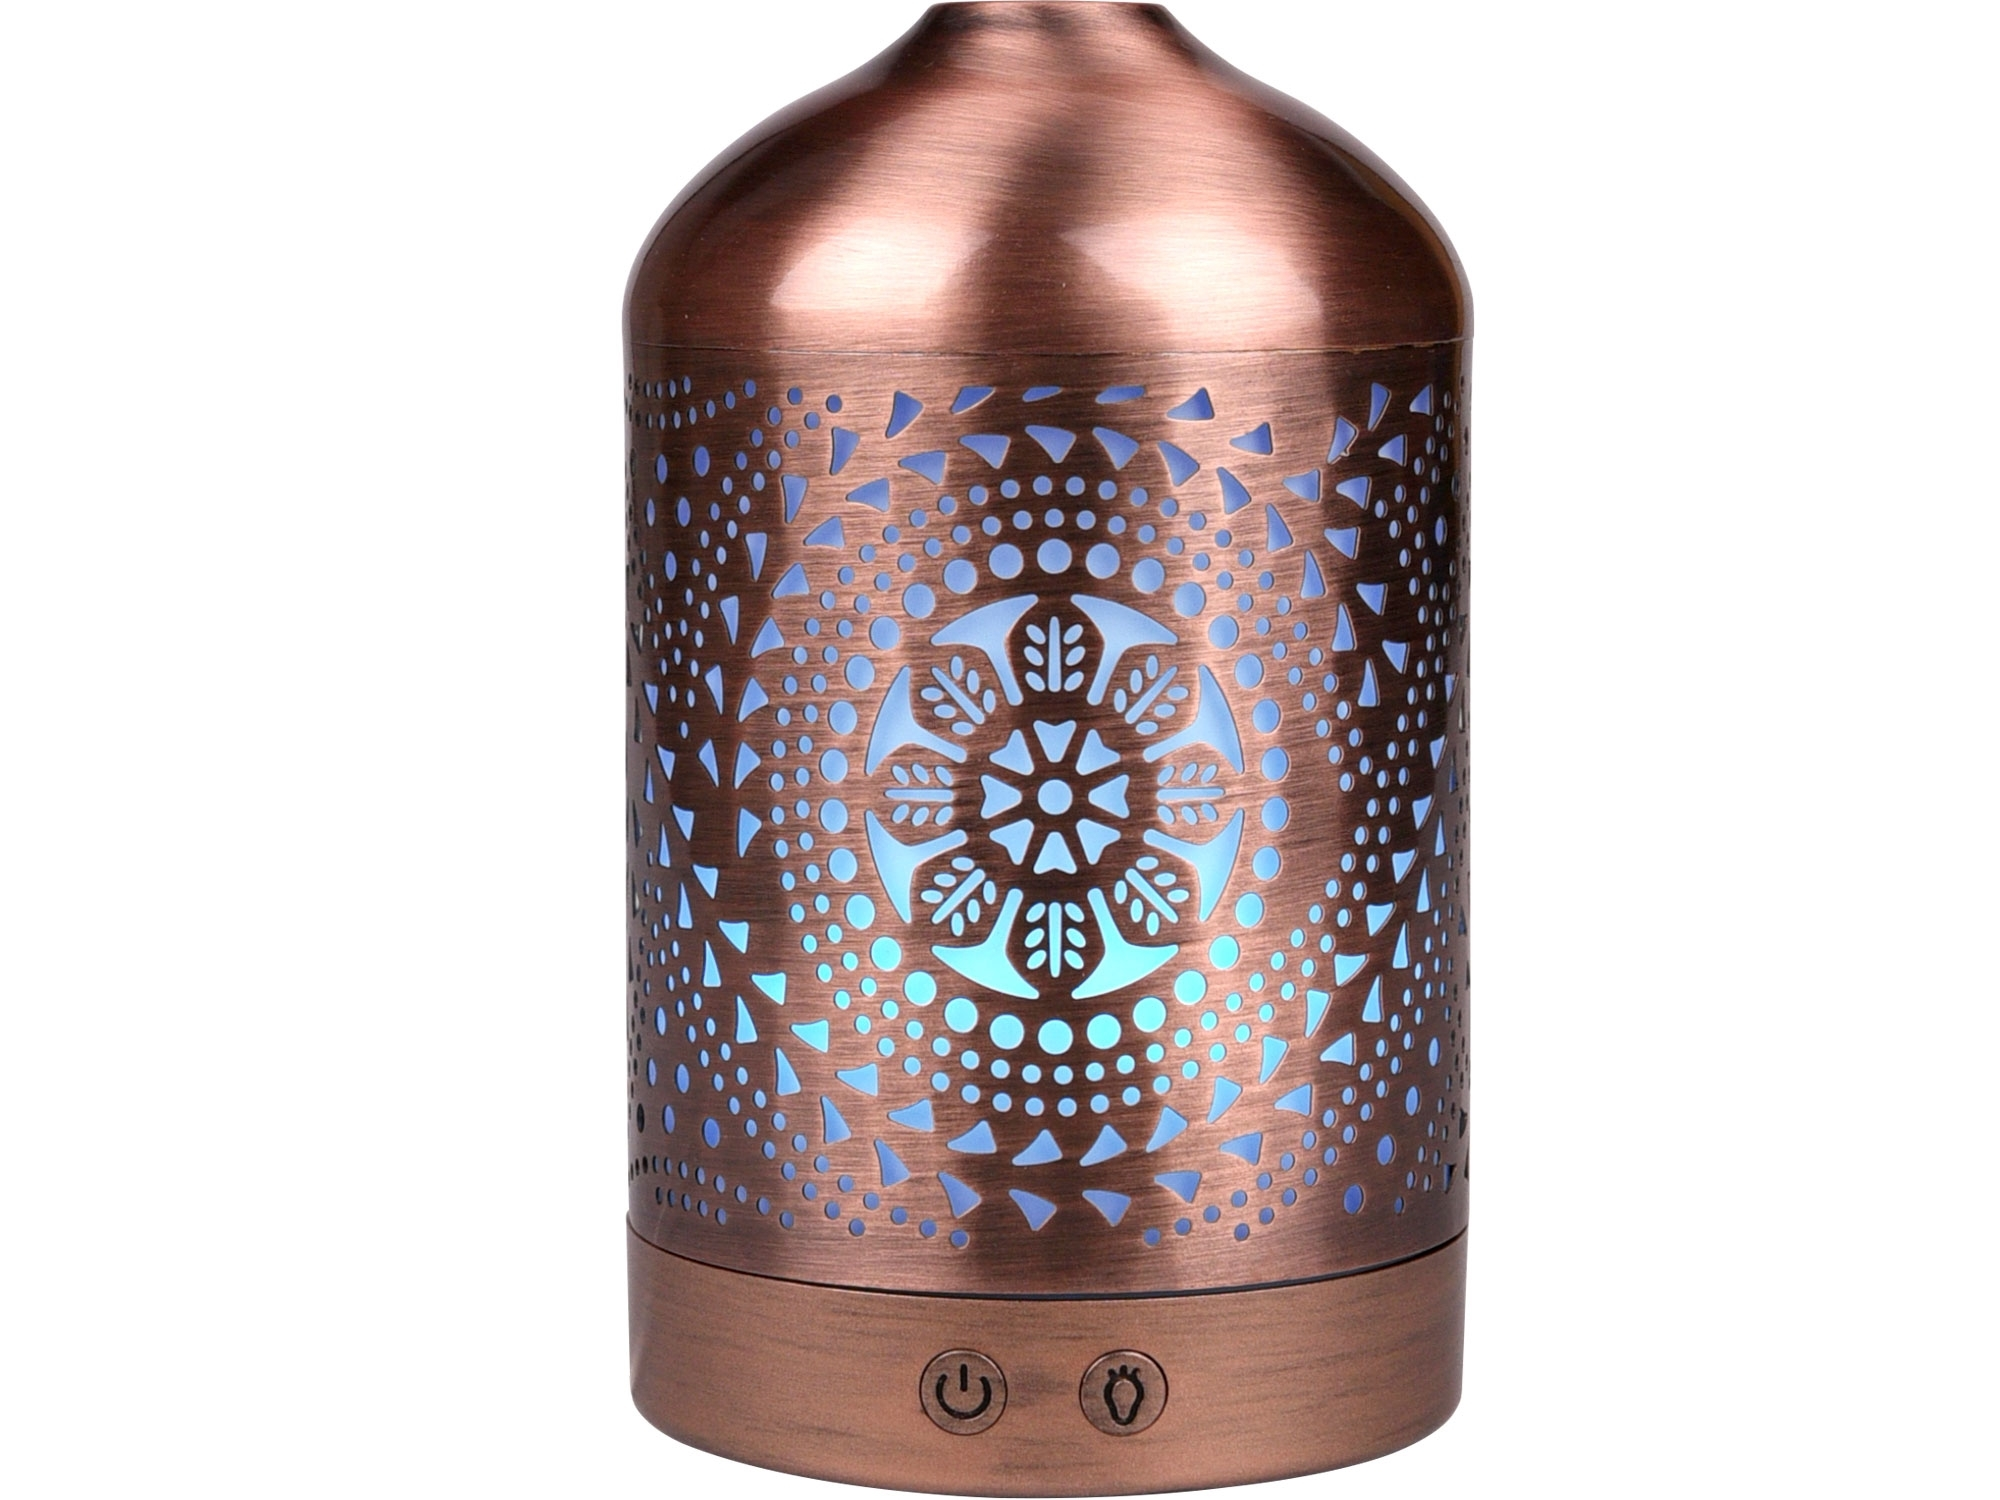 aroma difuzér ORIENT, osvěžovač a zvlhčovač vzduchu, kovový povrch